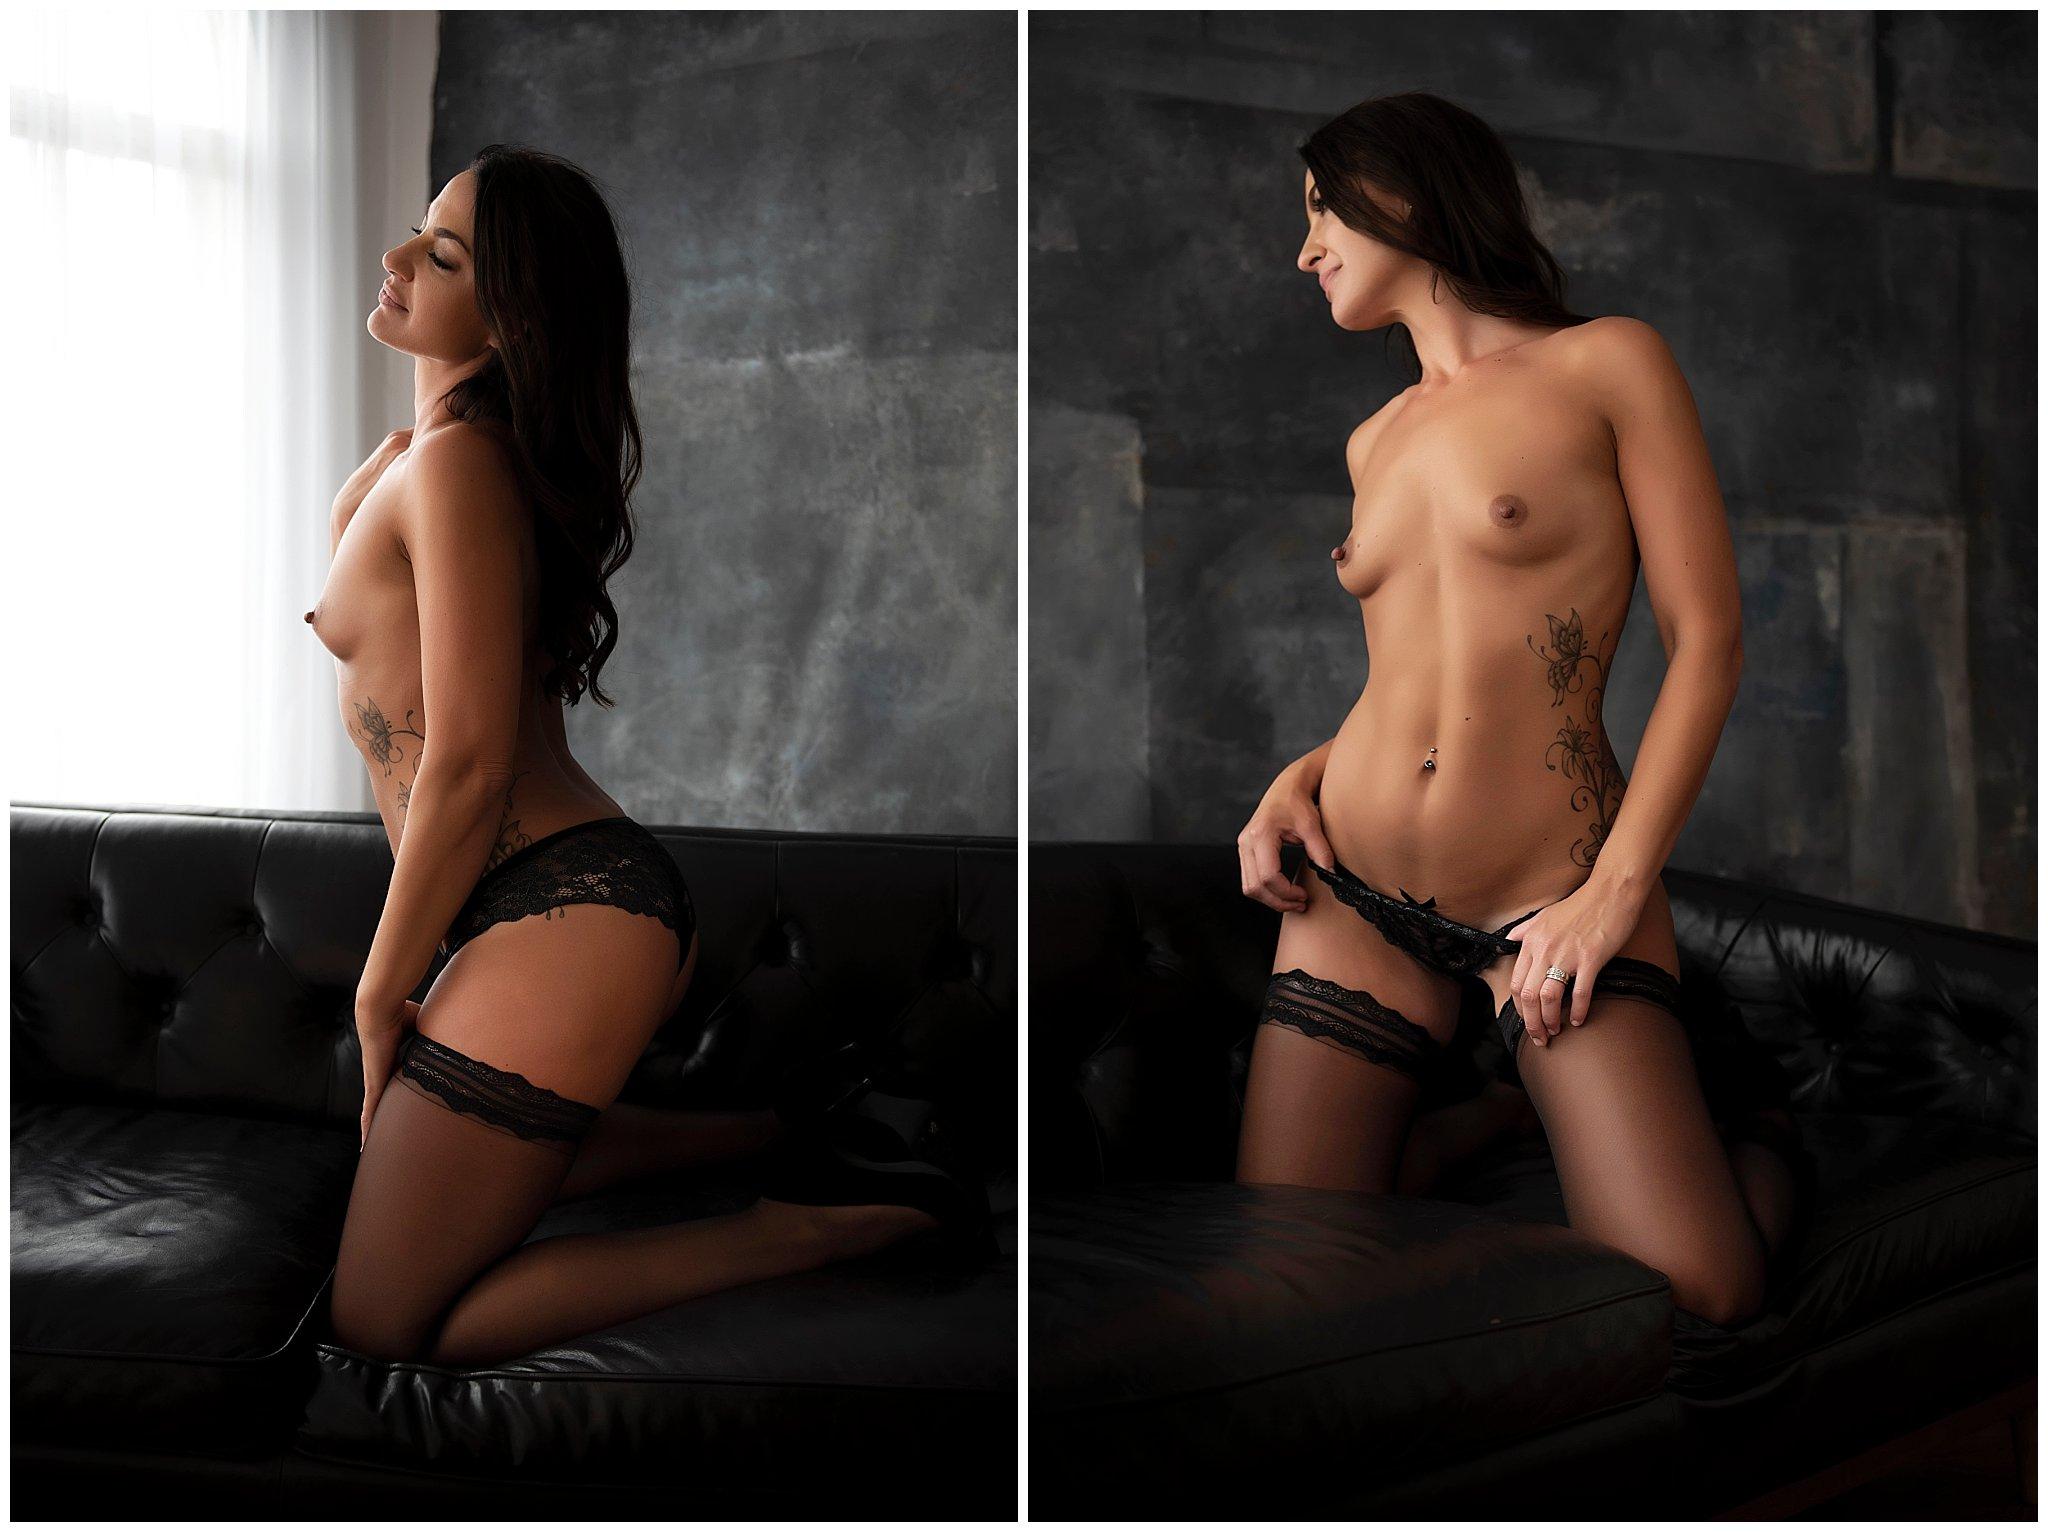 Intimate-boudoir-photoshoot-010.jpg